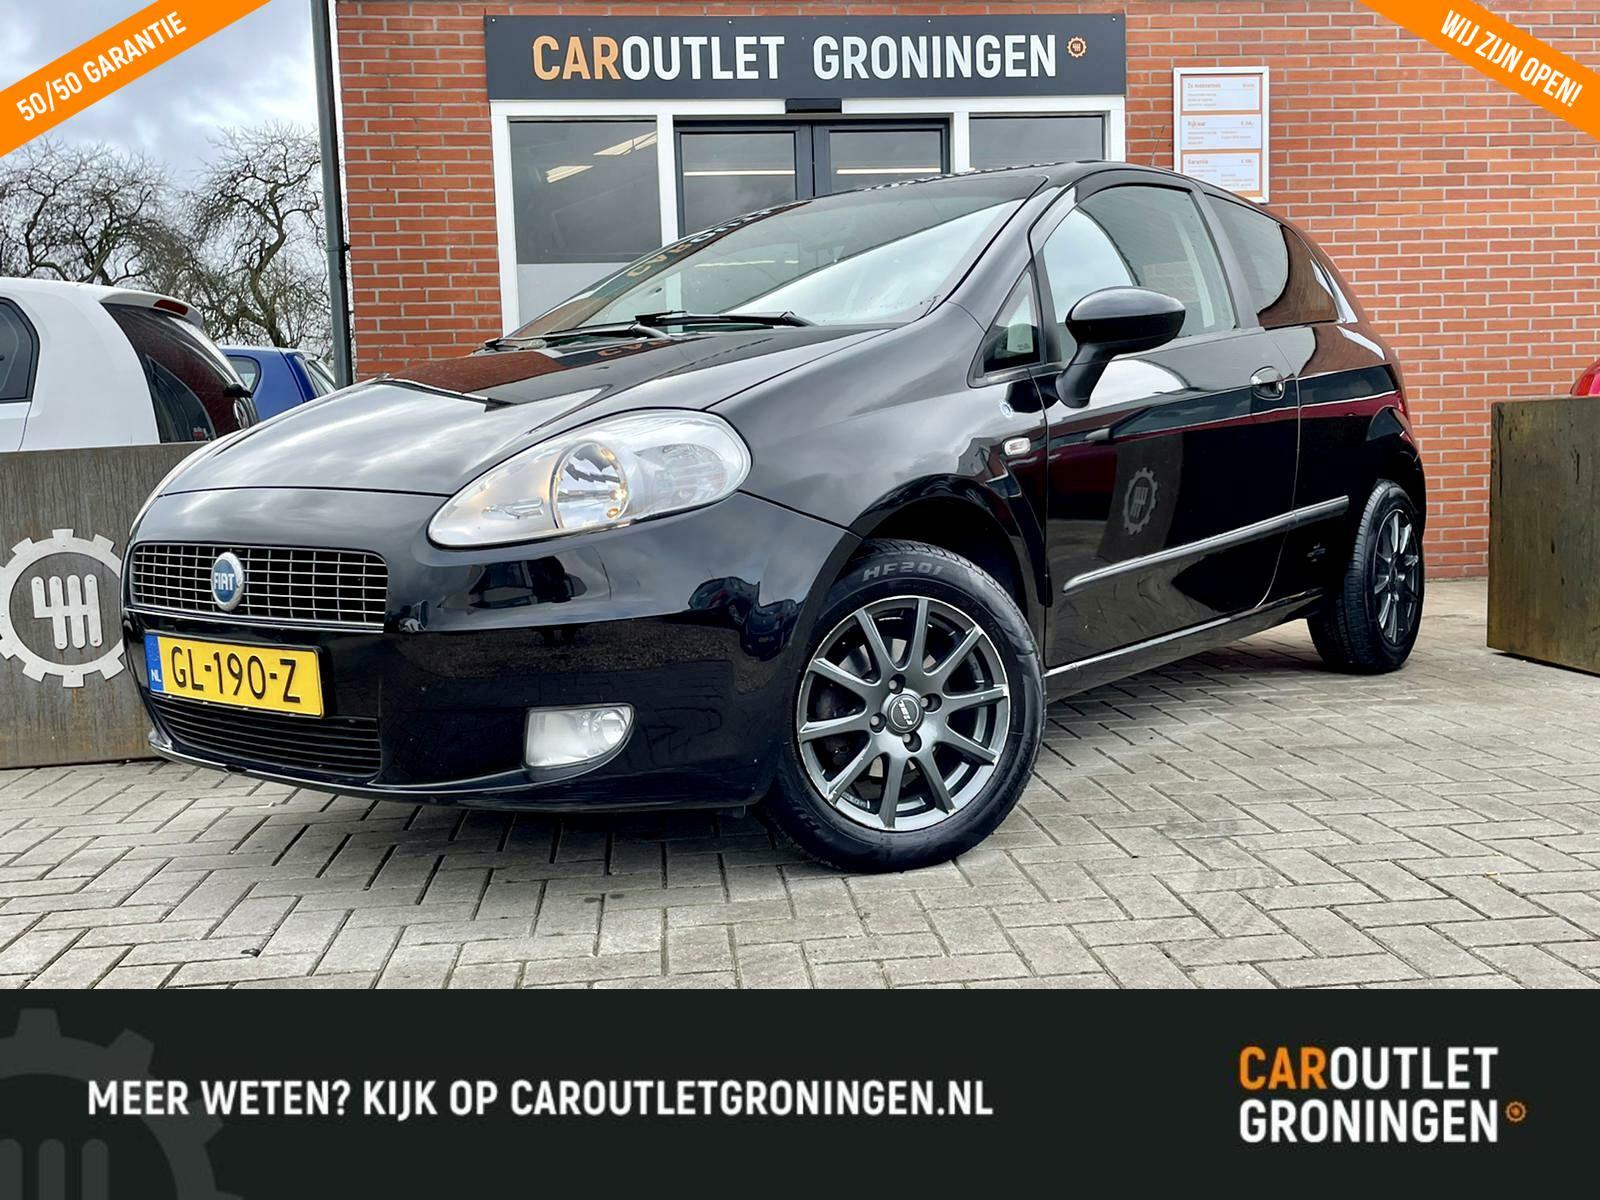 Caroutlet Groningen - Fiat Grande Punto 1.4 Edizione Blue & Me| NW APK | CLIMA | CRUISE